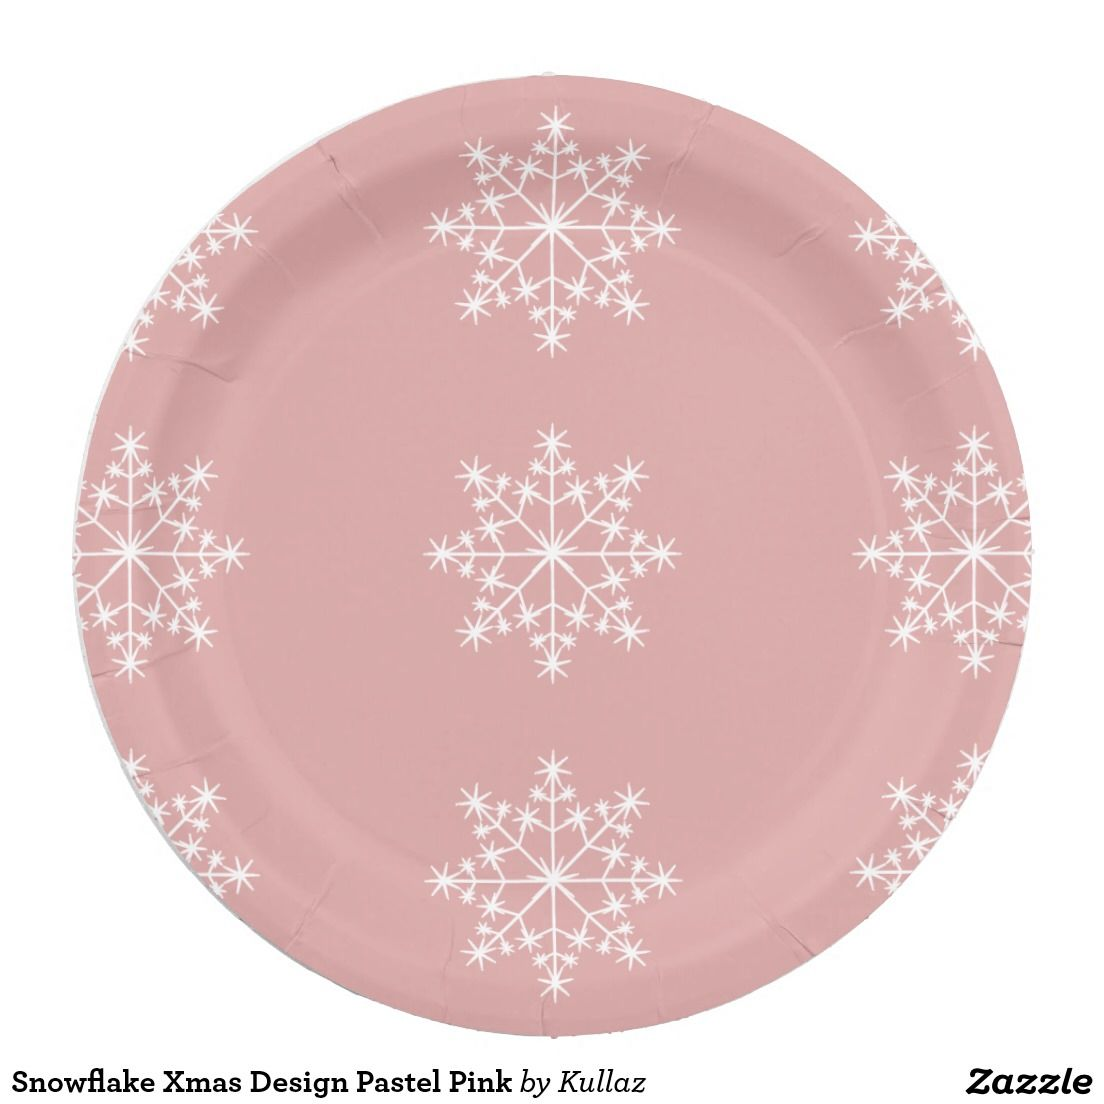 Snowflake Xmas Design Pastel Pink Paper Plate | Christmas Paper ...